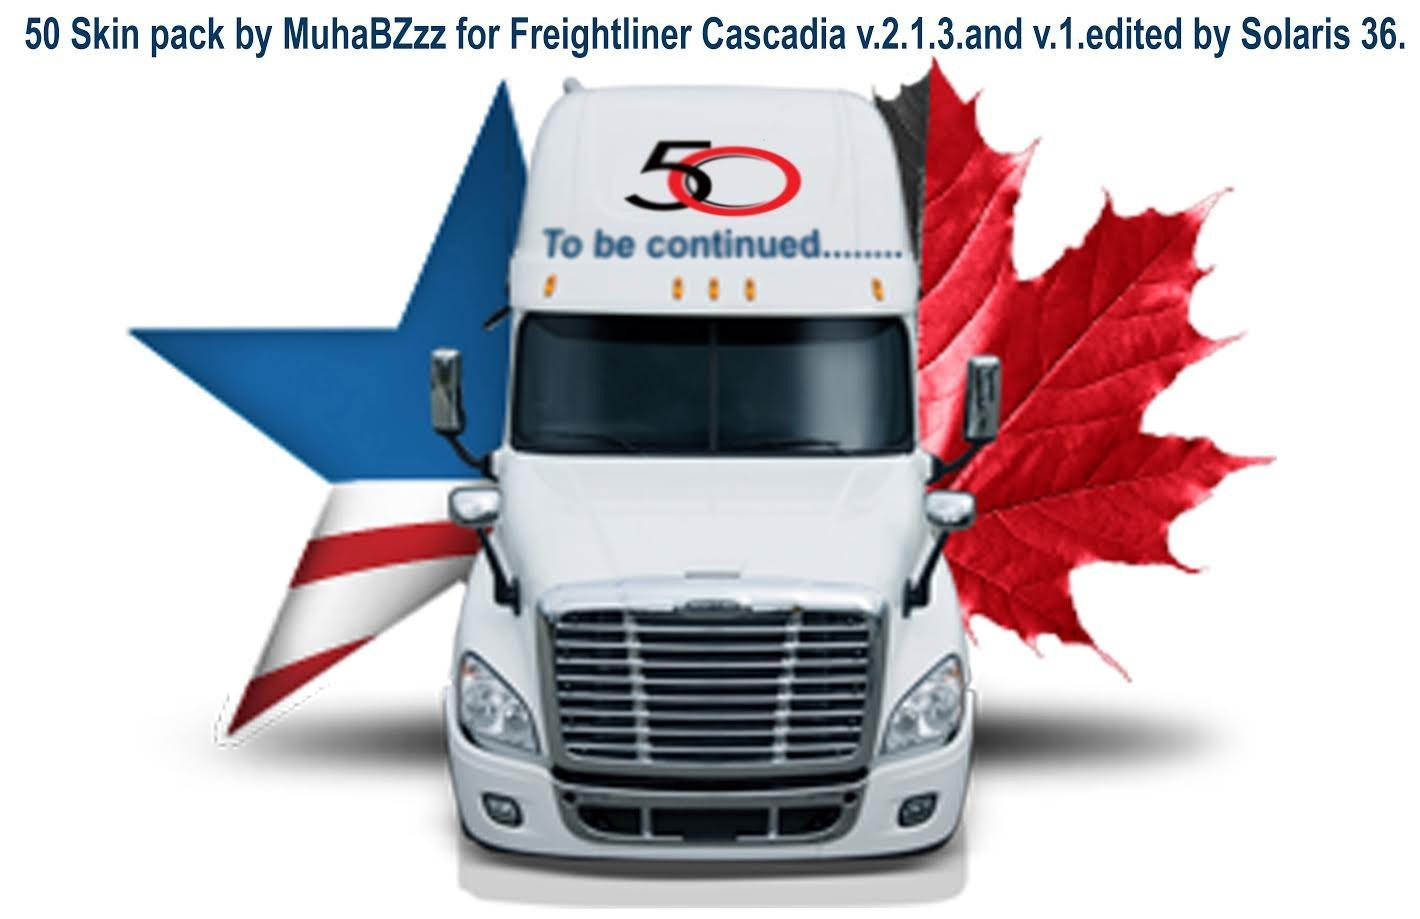 50 Skin Pack for Freightliner Cascadia V2.1.3 edited by Solaris36